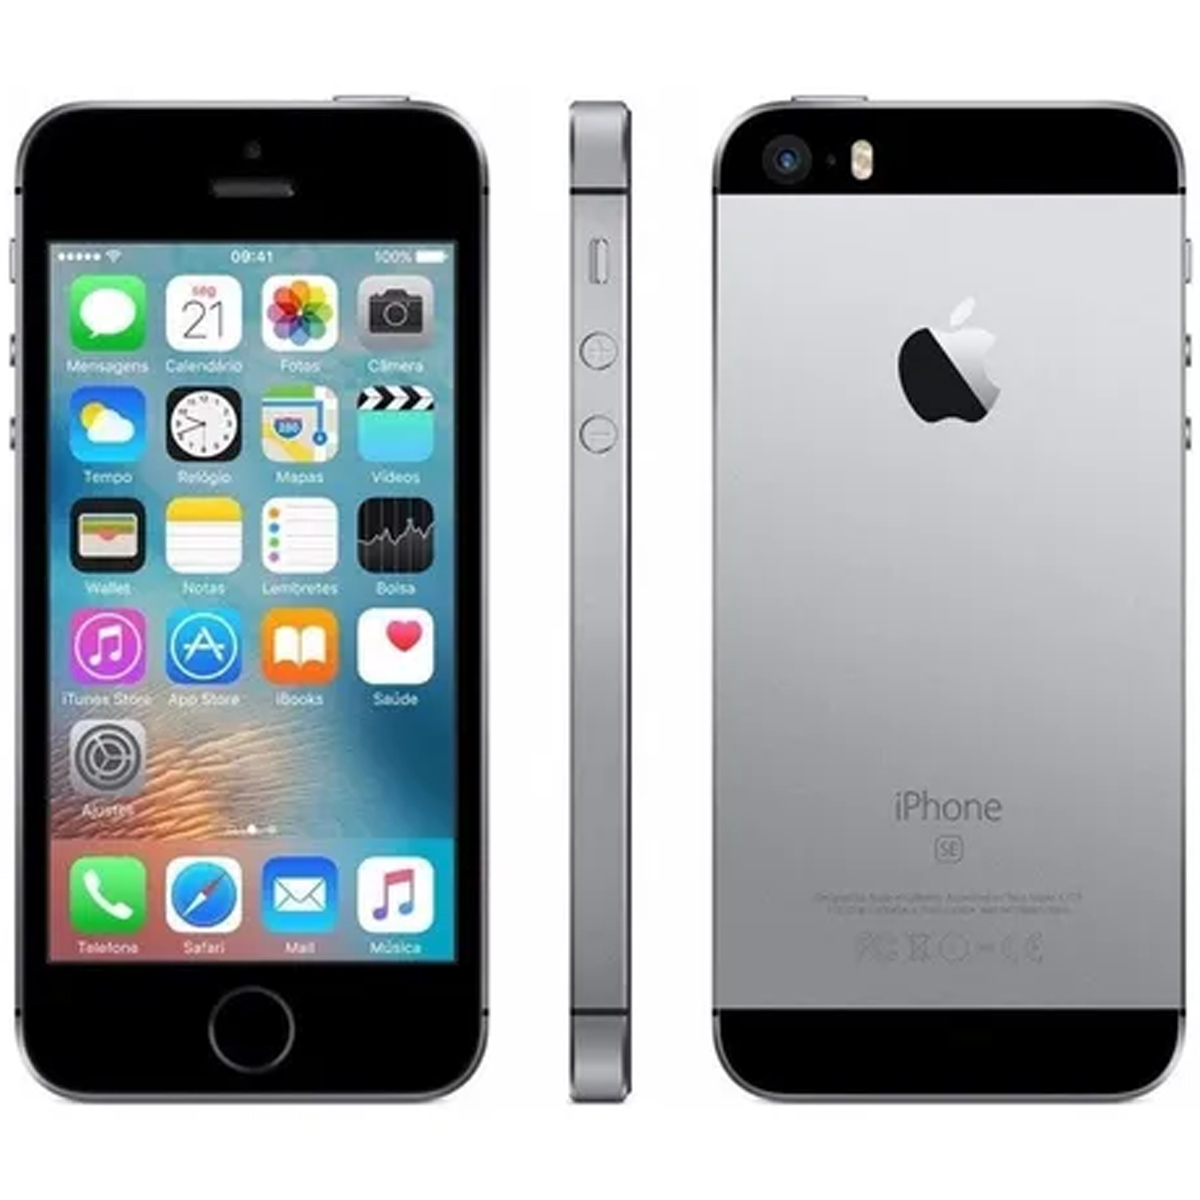 Apple iPhone SE 16gb Tela 4' Retina 12mp Anatel Seminovo